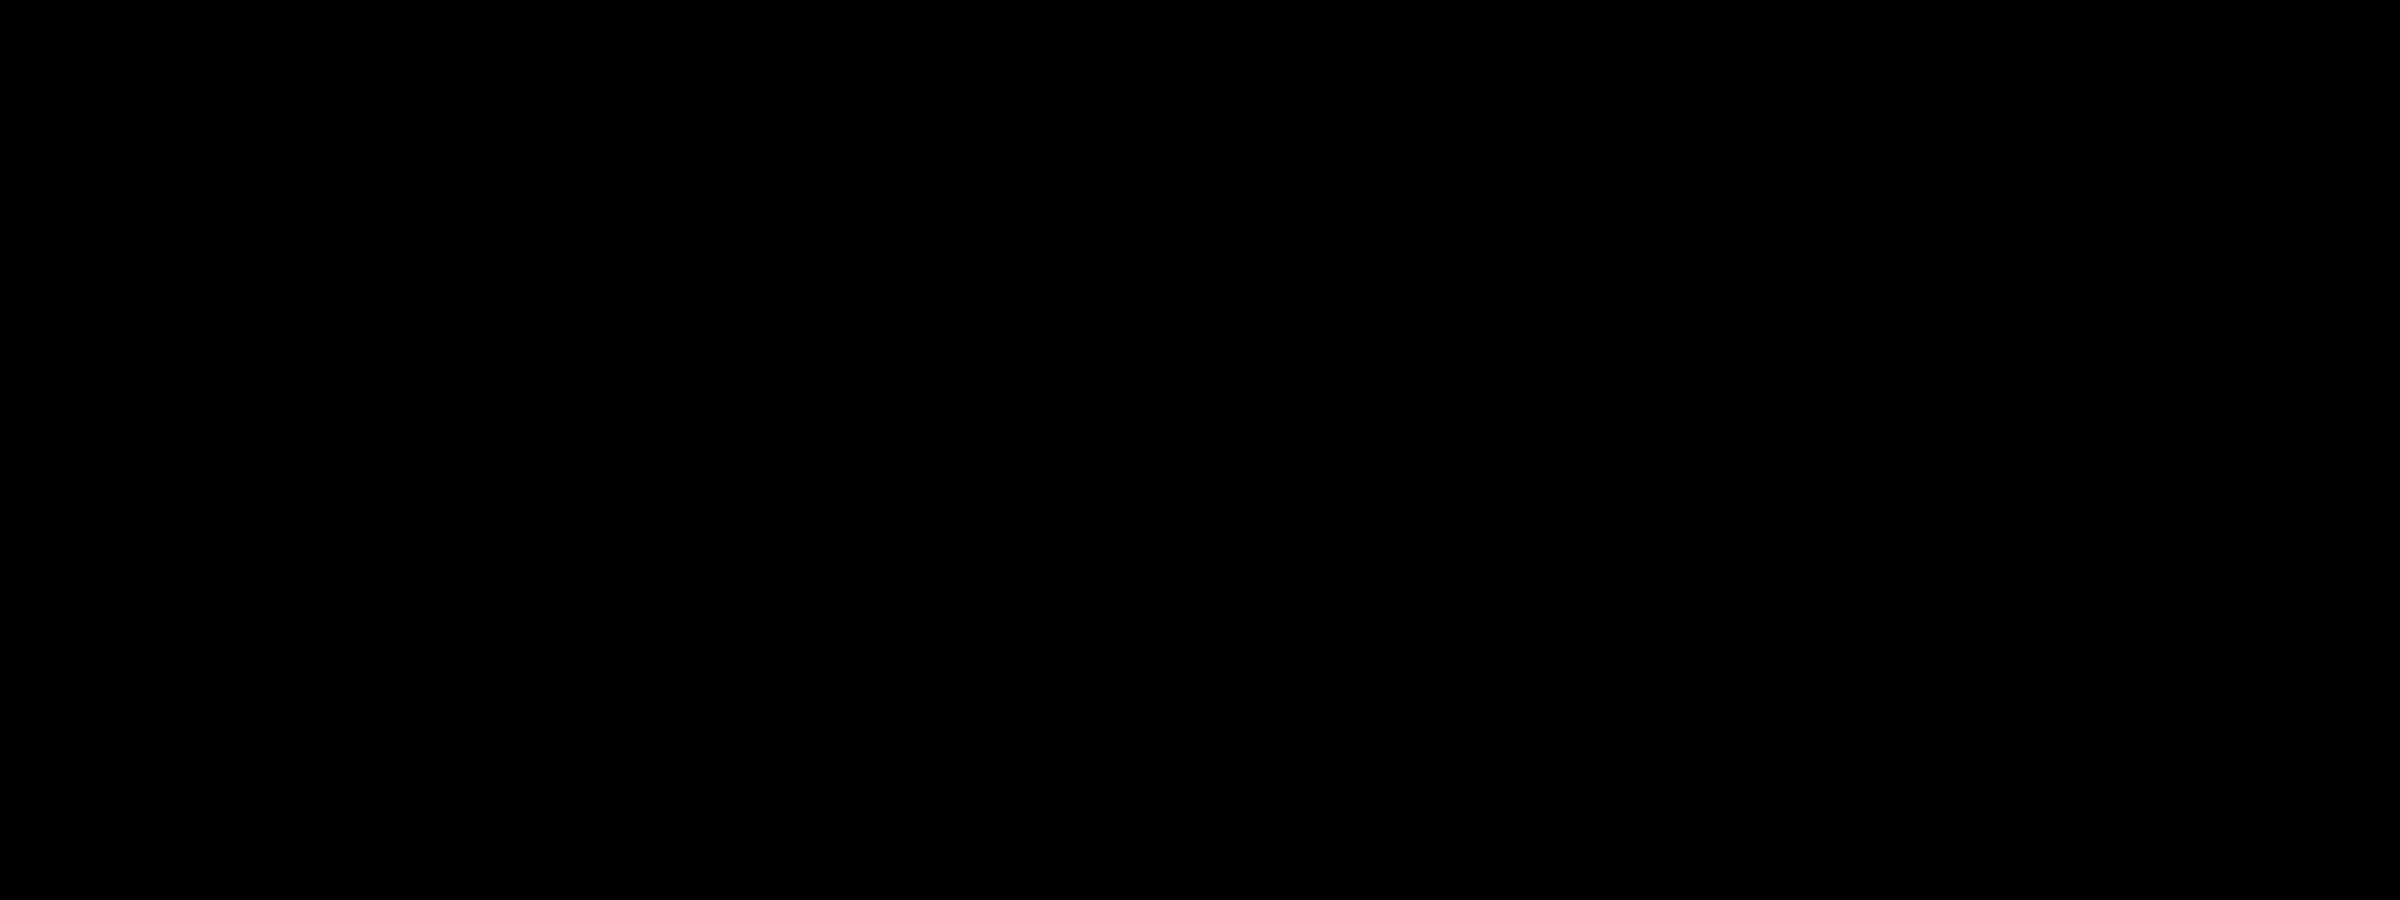 Clipart train outline. Big image png